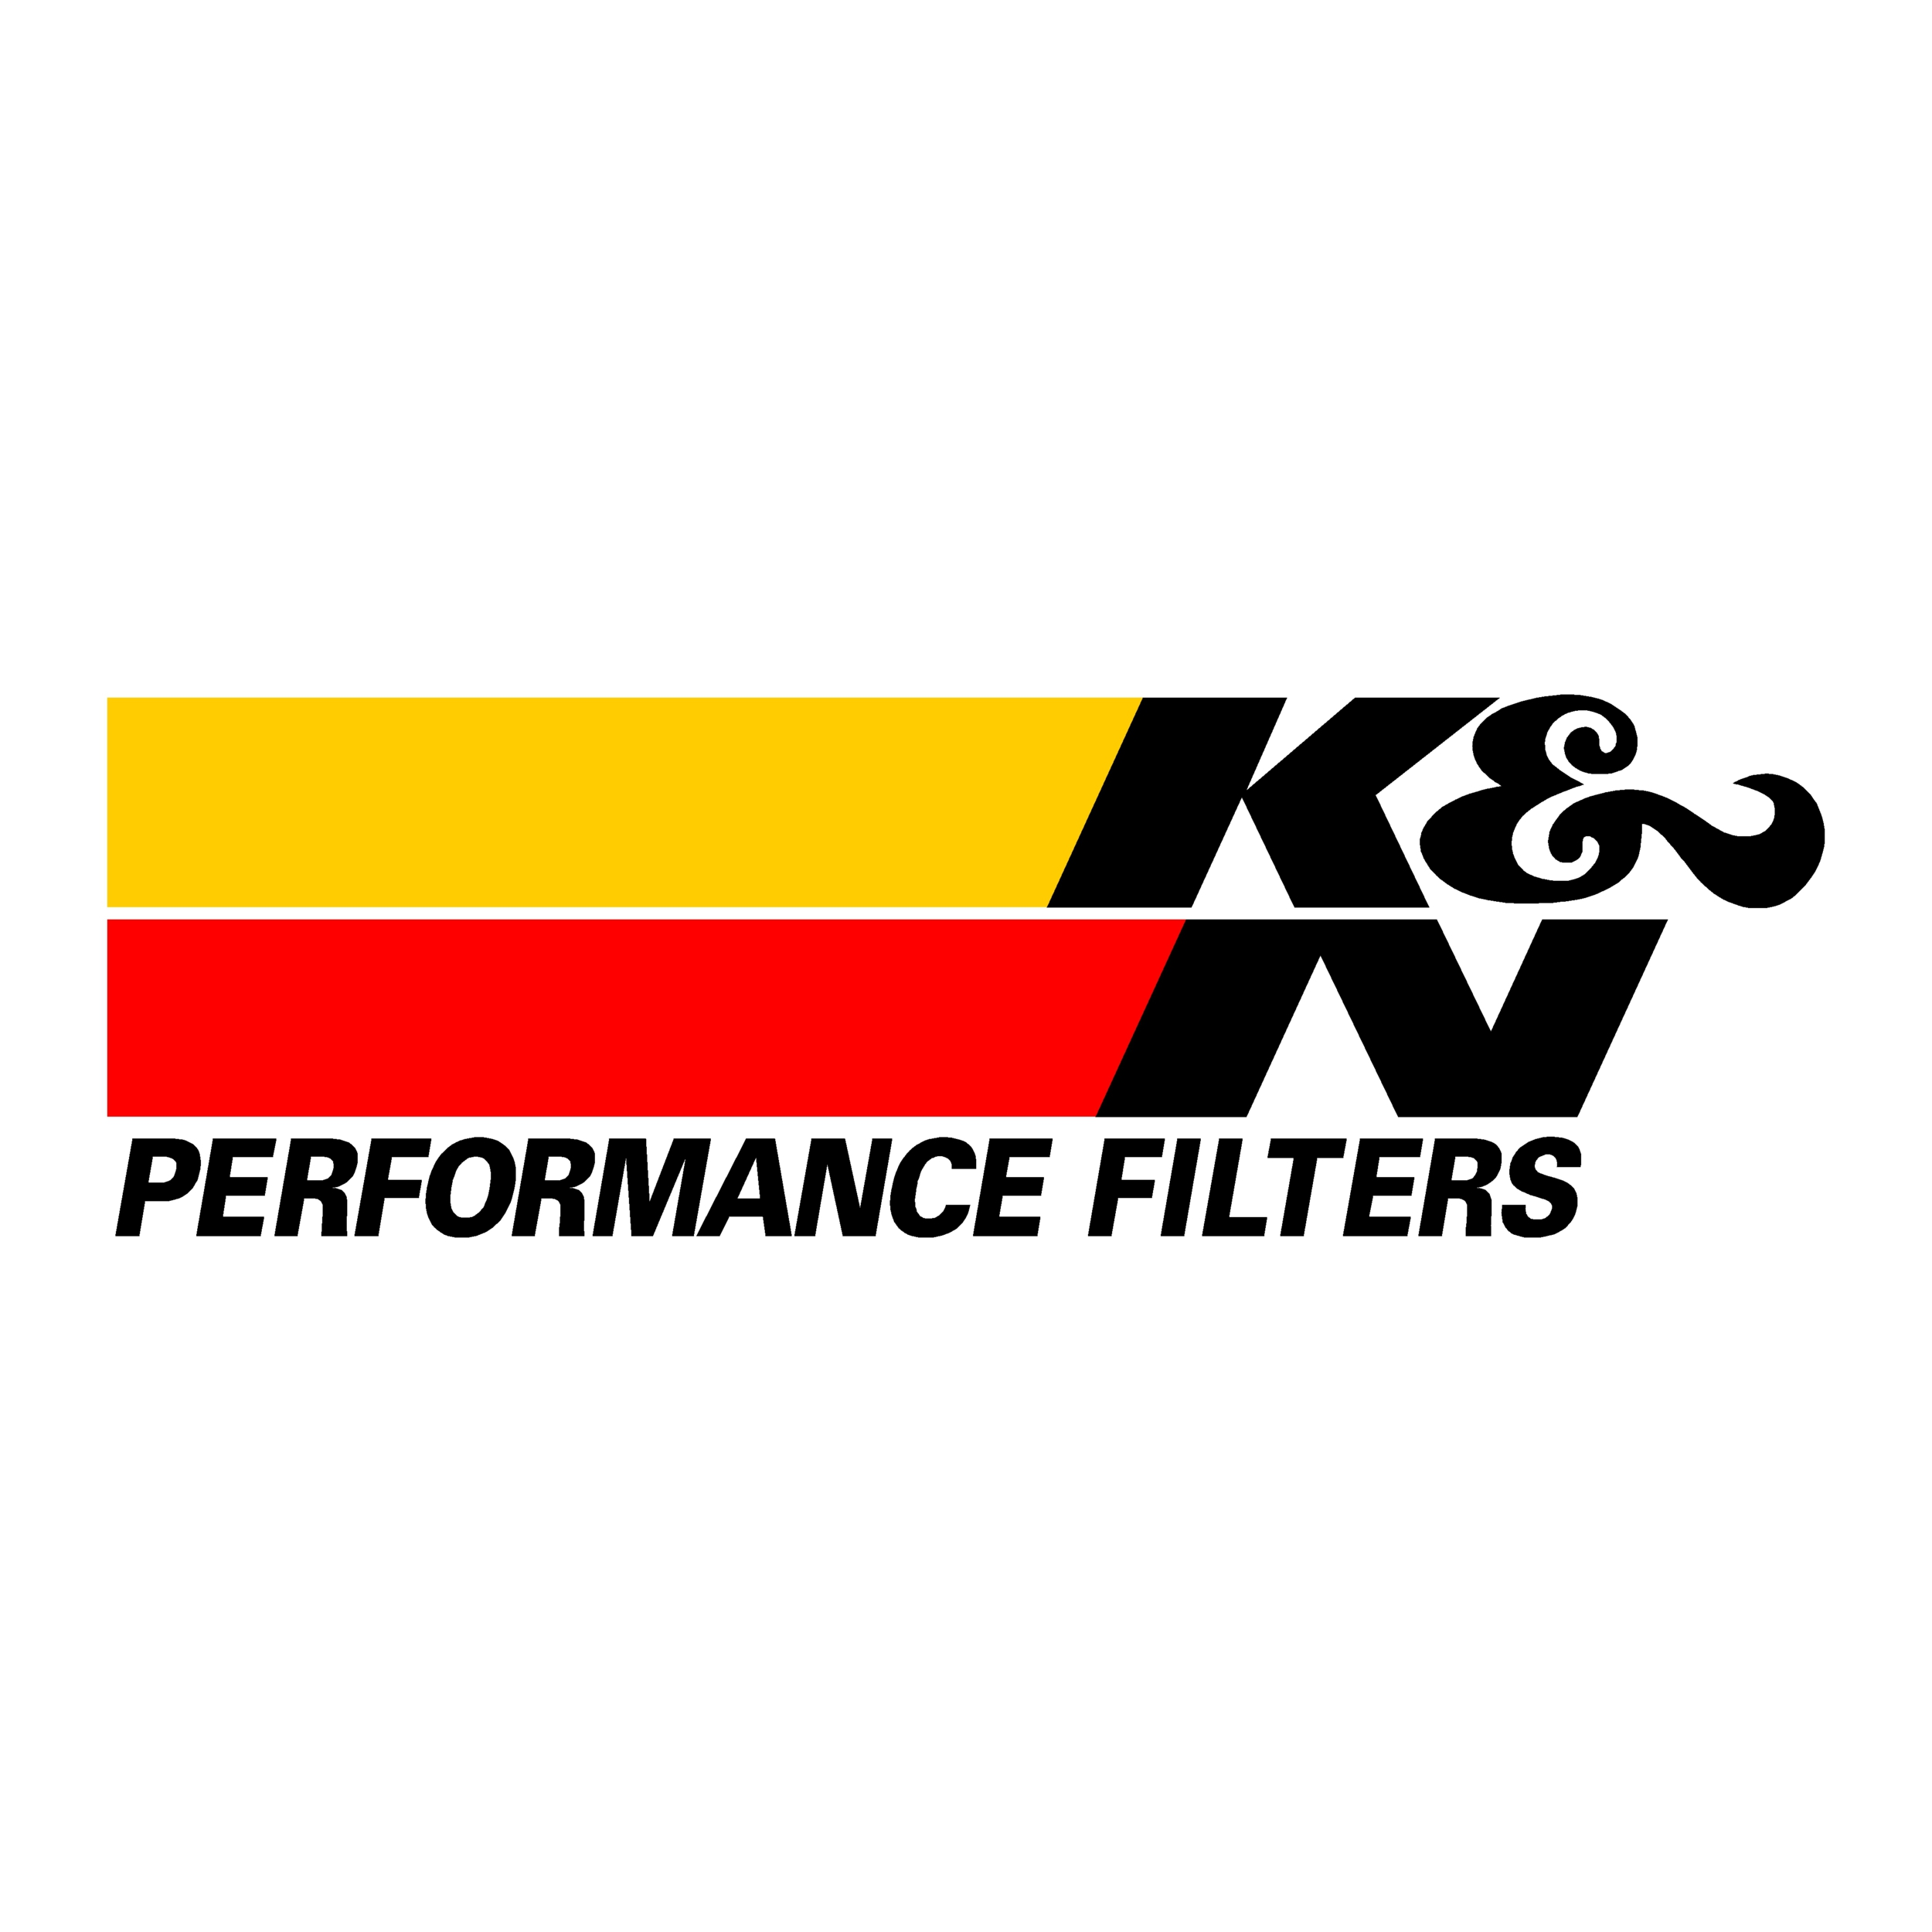 stickers kn filter ref 1 tuning audio 4x4 sonorisation car auto moto camion competition deco rallye autocollant